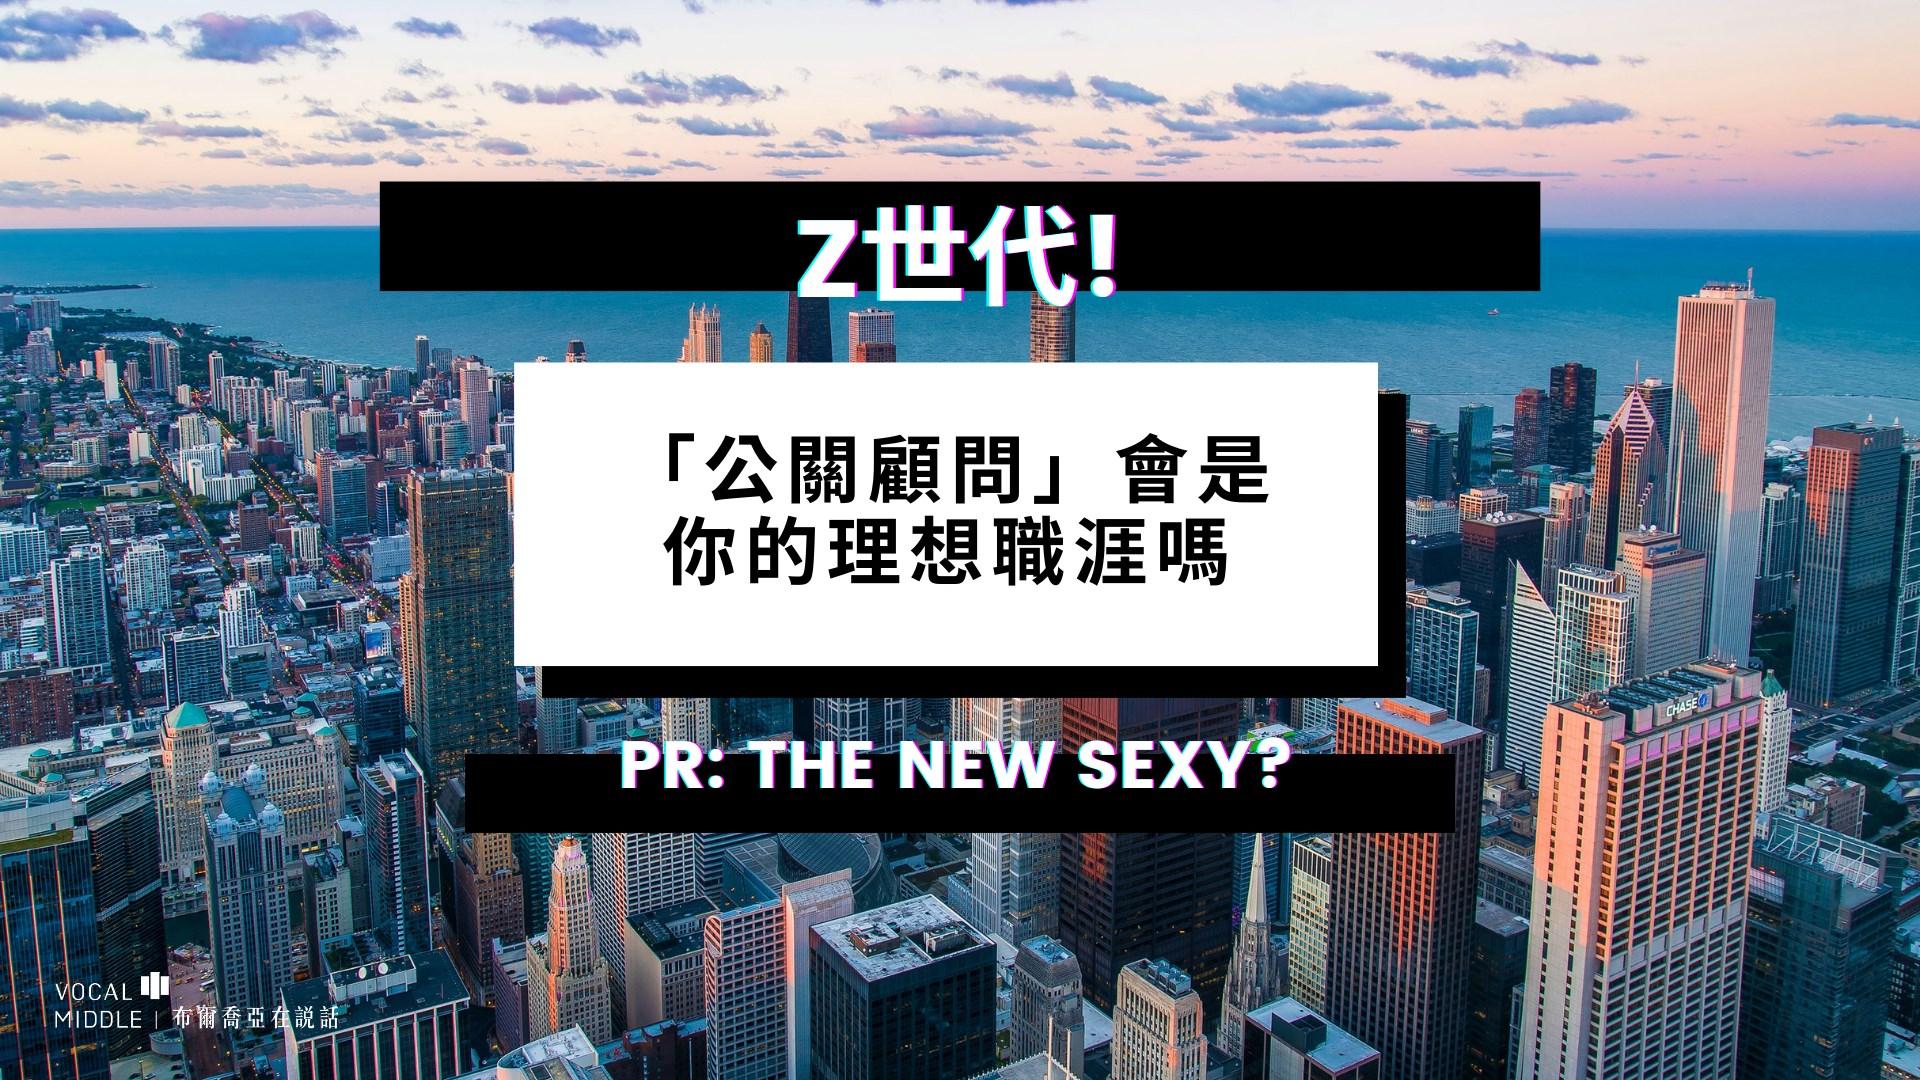 【VOCAL of Hiring】 Z世代看過來!公關顧問是否為一個理想職涯選擇嗎